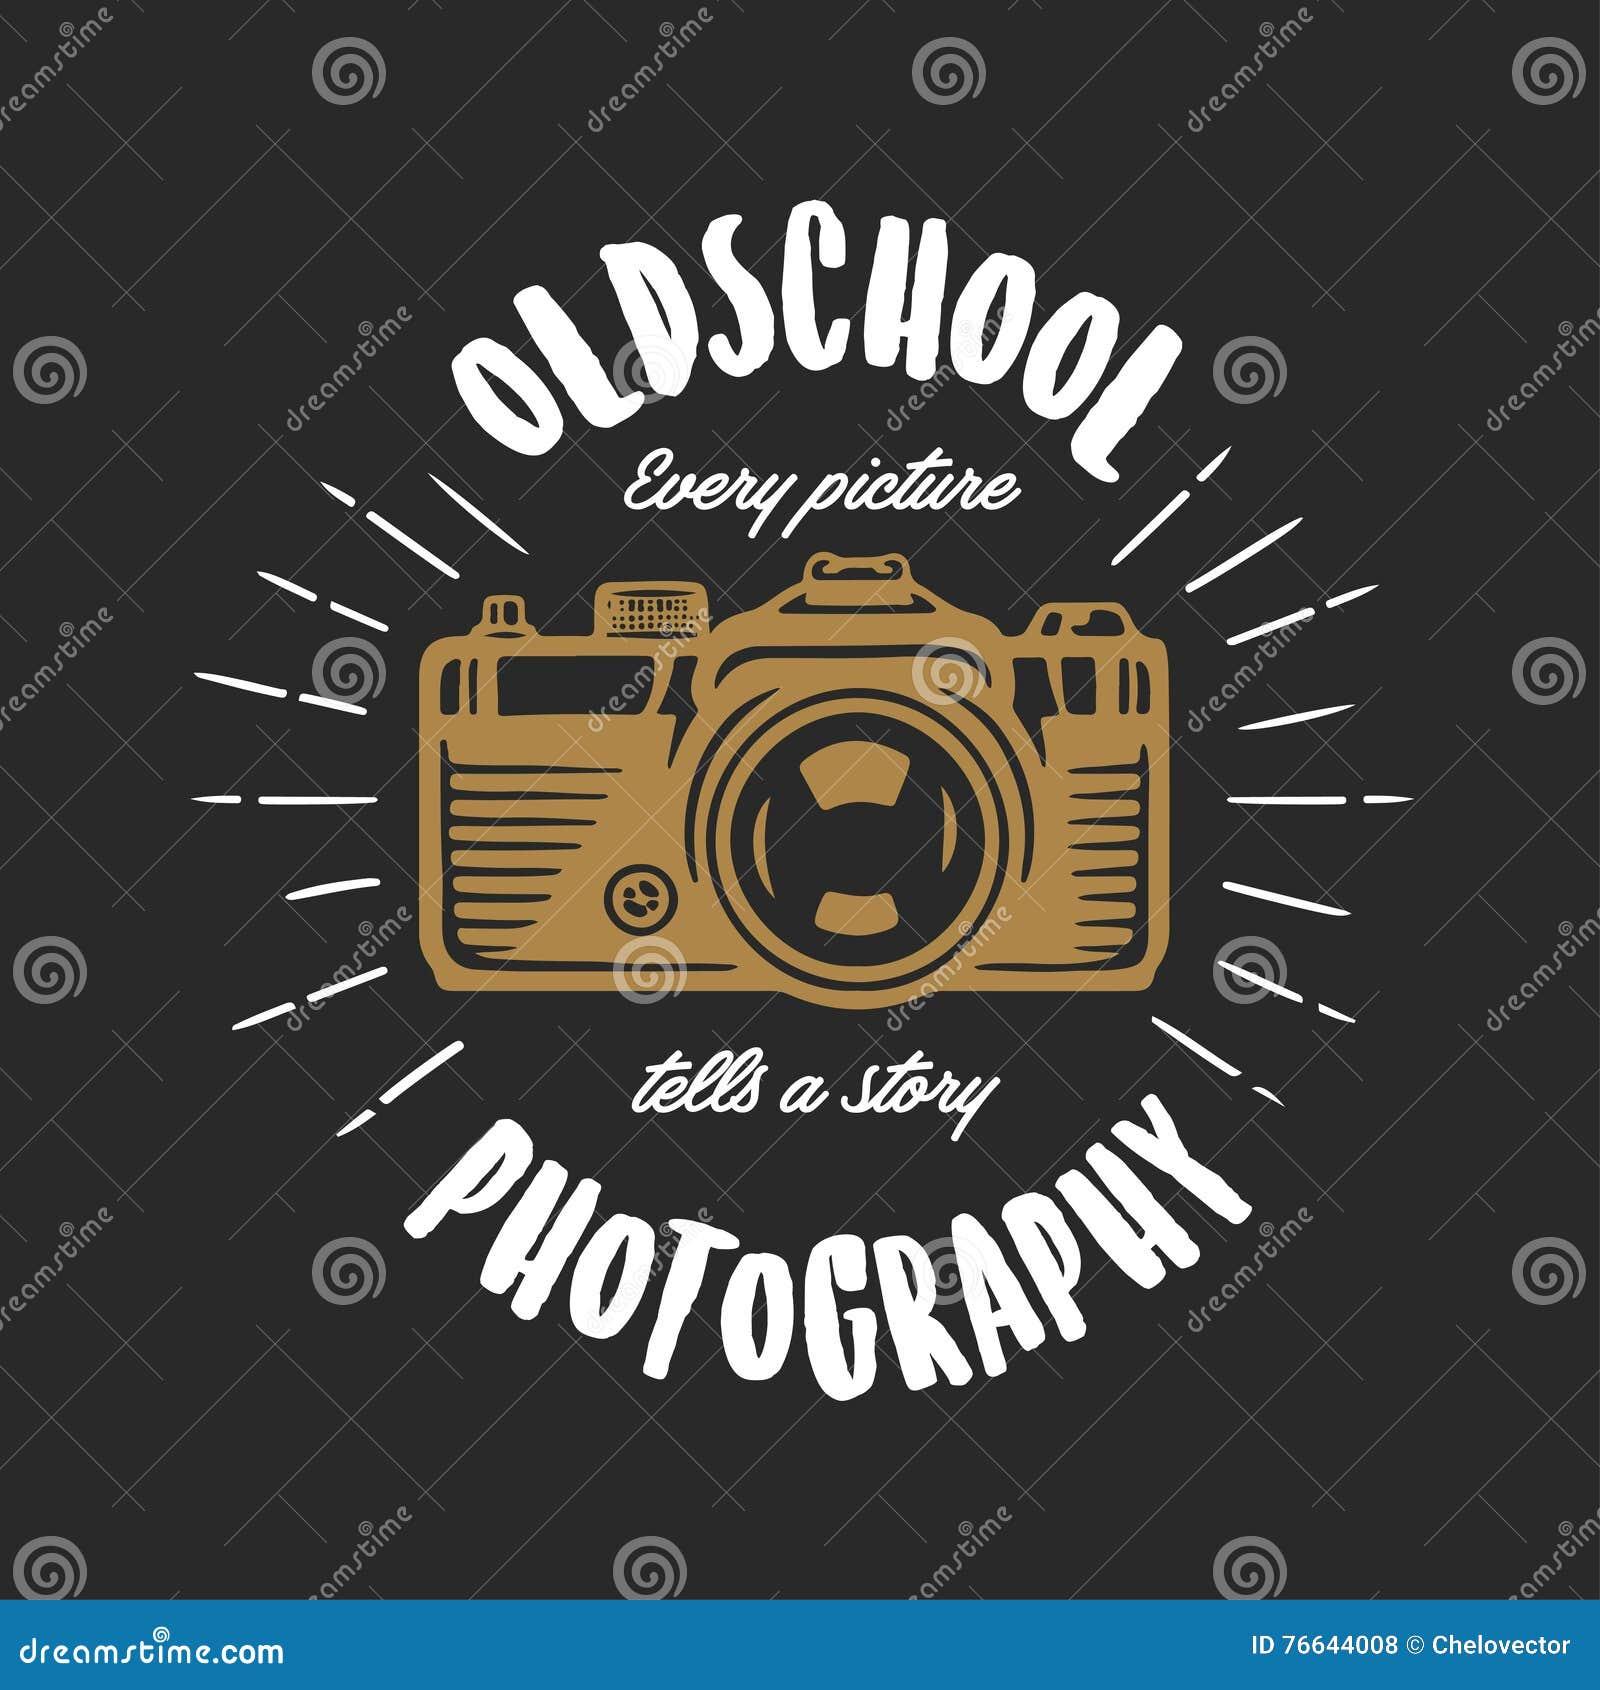 Shirt design vintage - Oldschool Photography Vintage T Shirt Design Vector Illustration Royalty Free Stock Photos